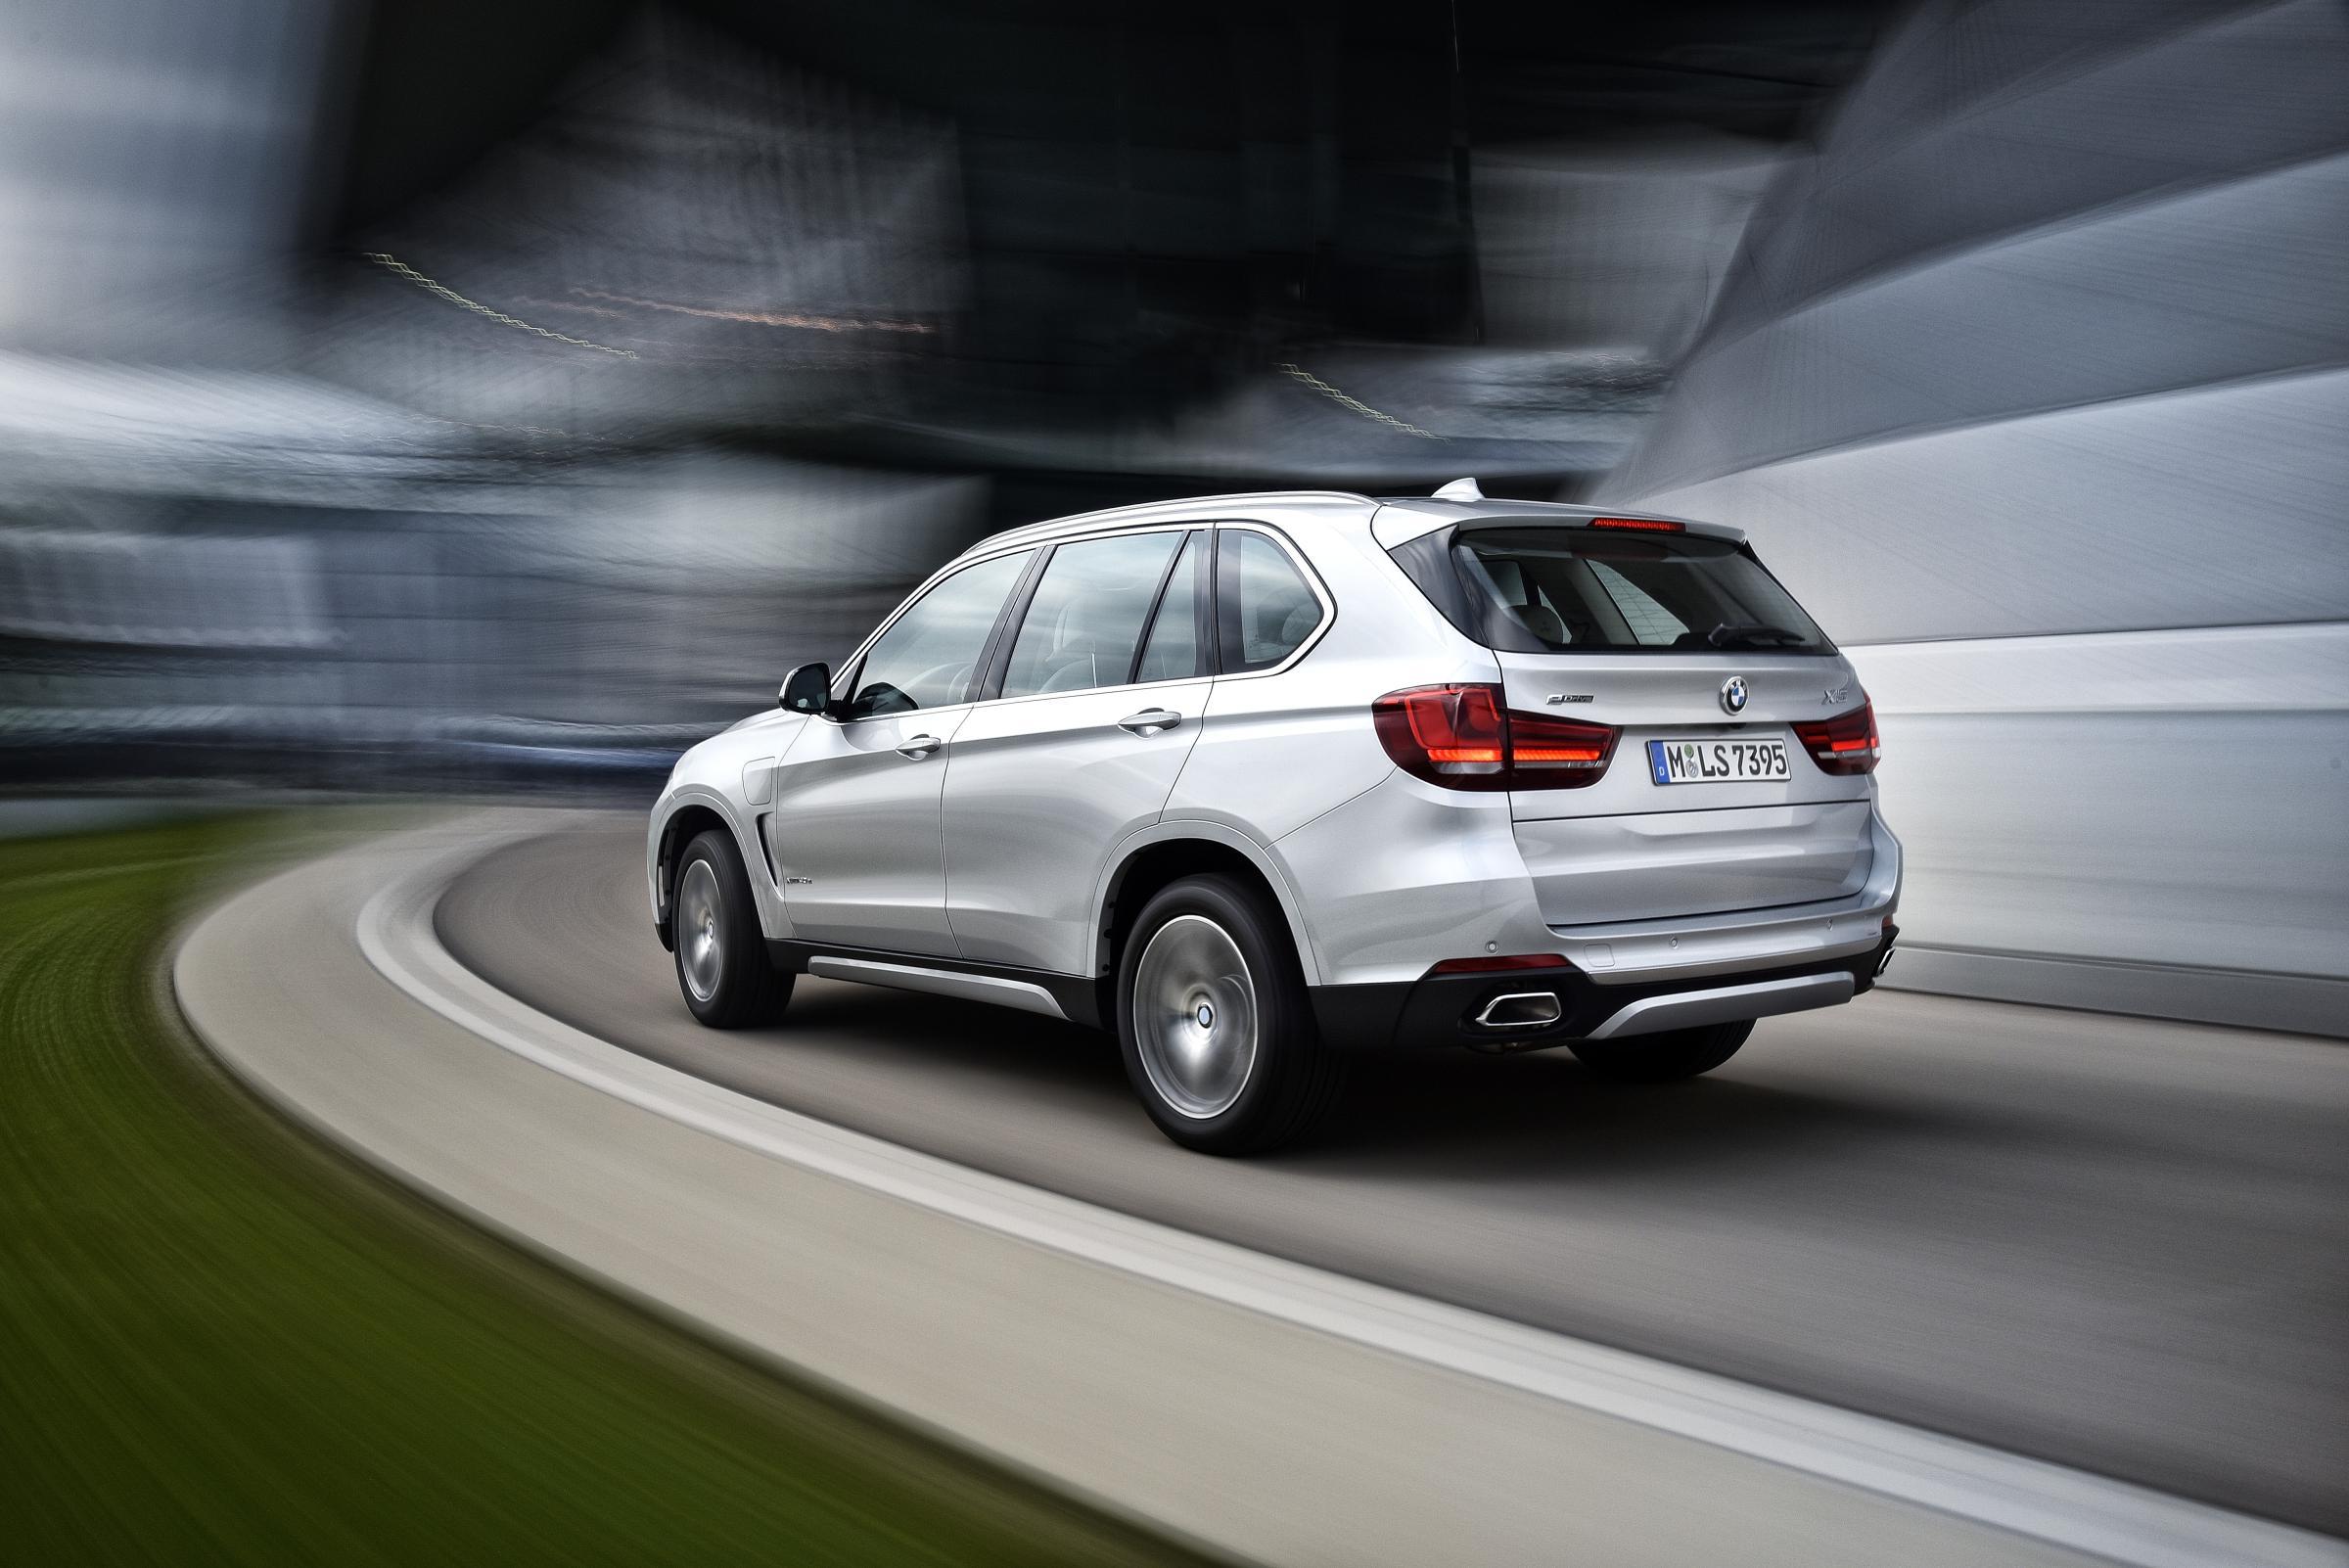 BMW X5 hibrido 2